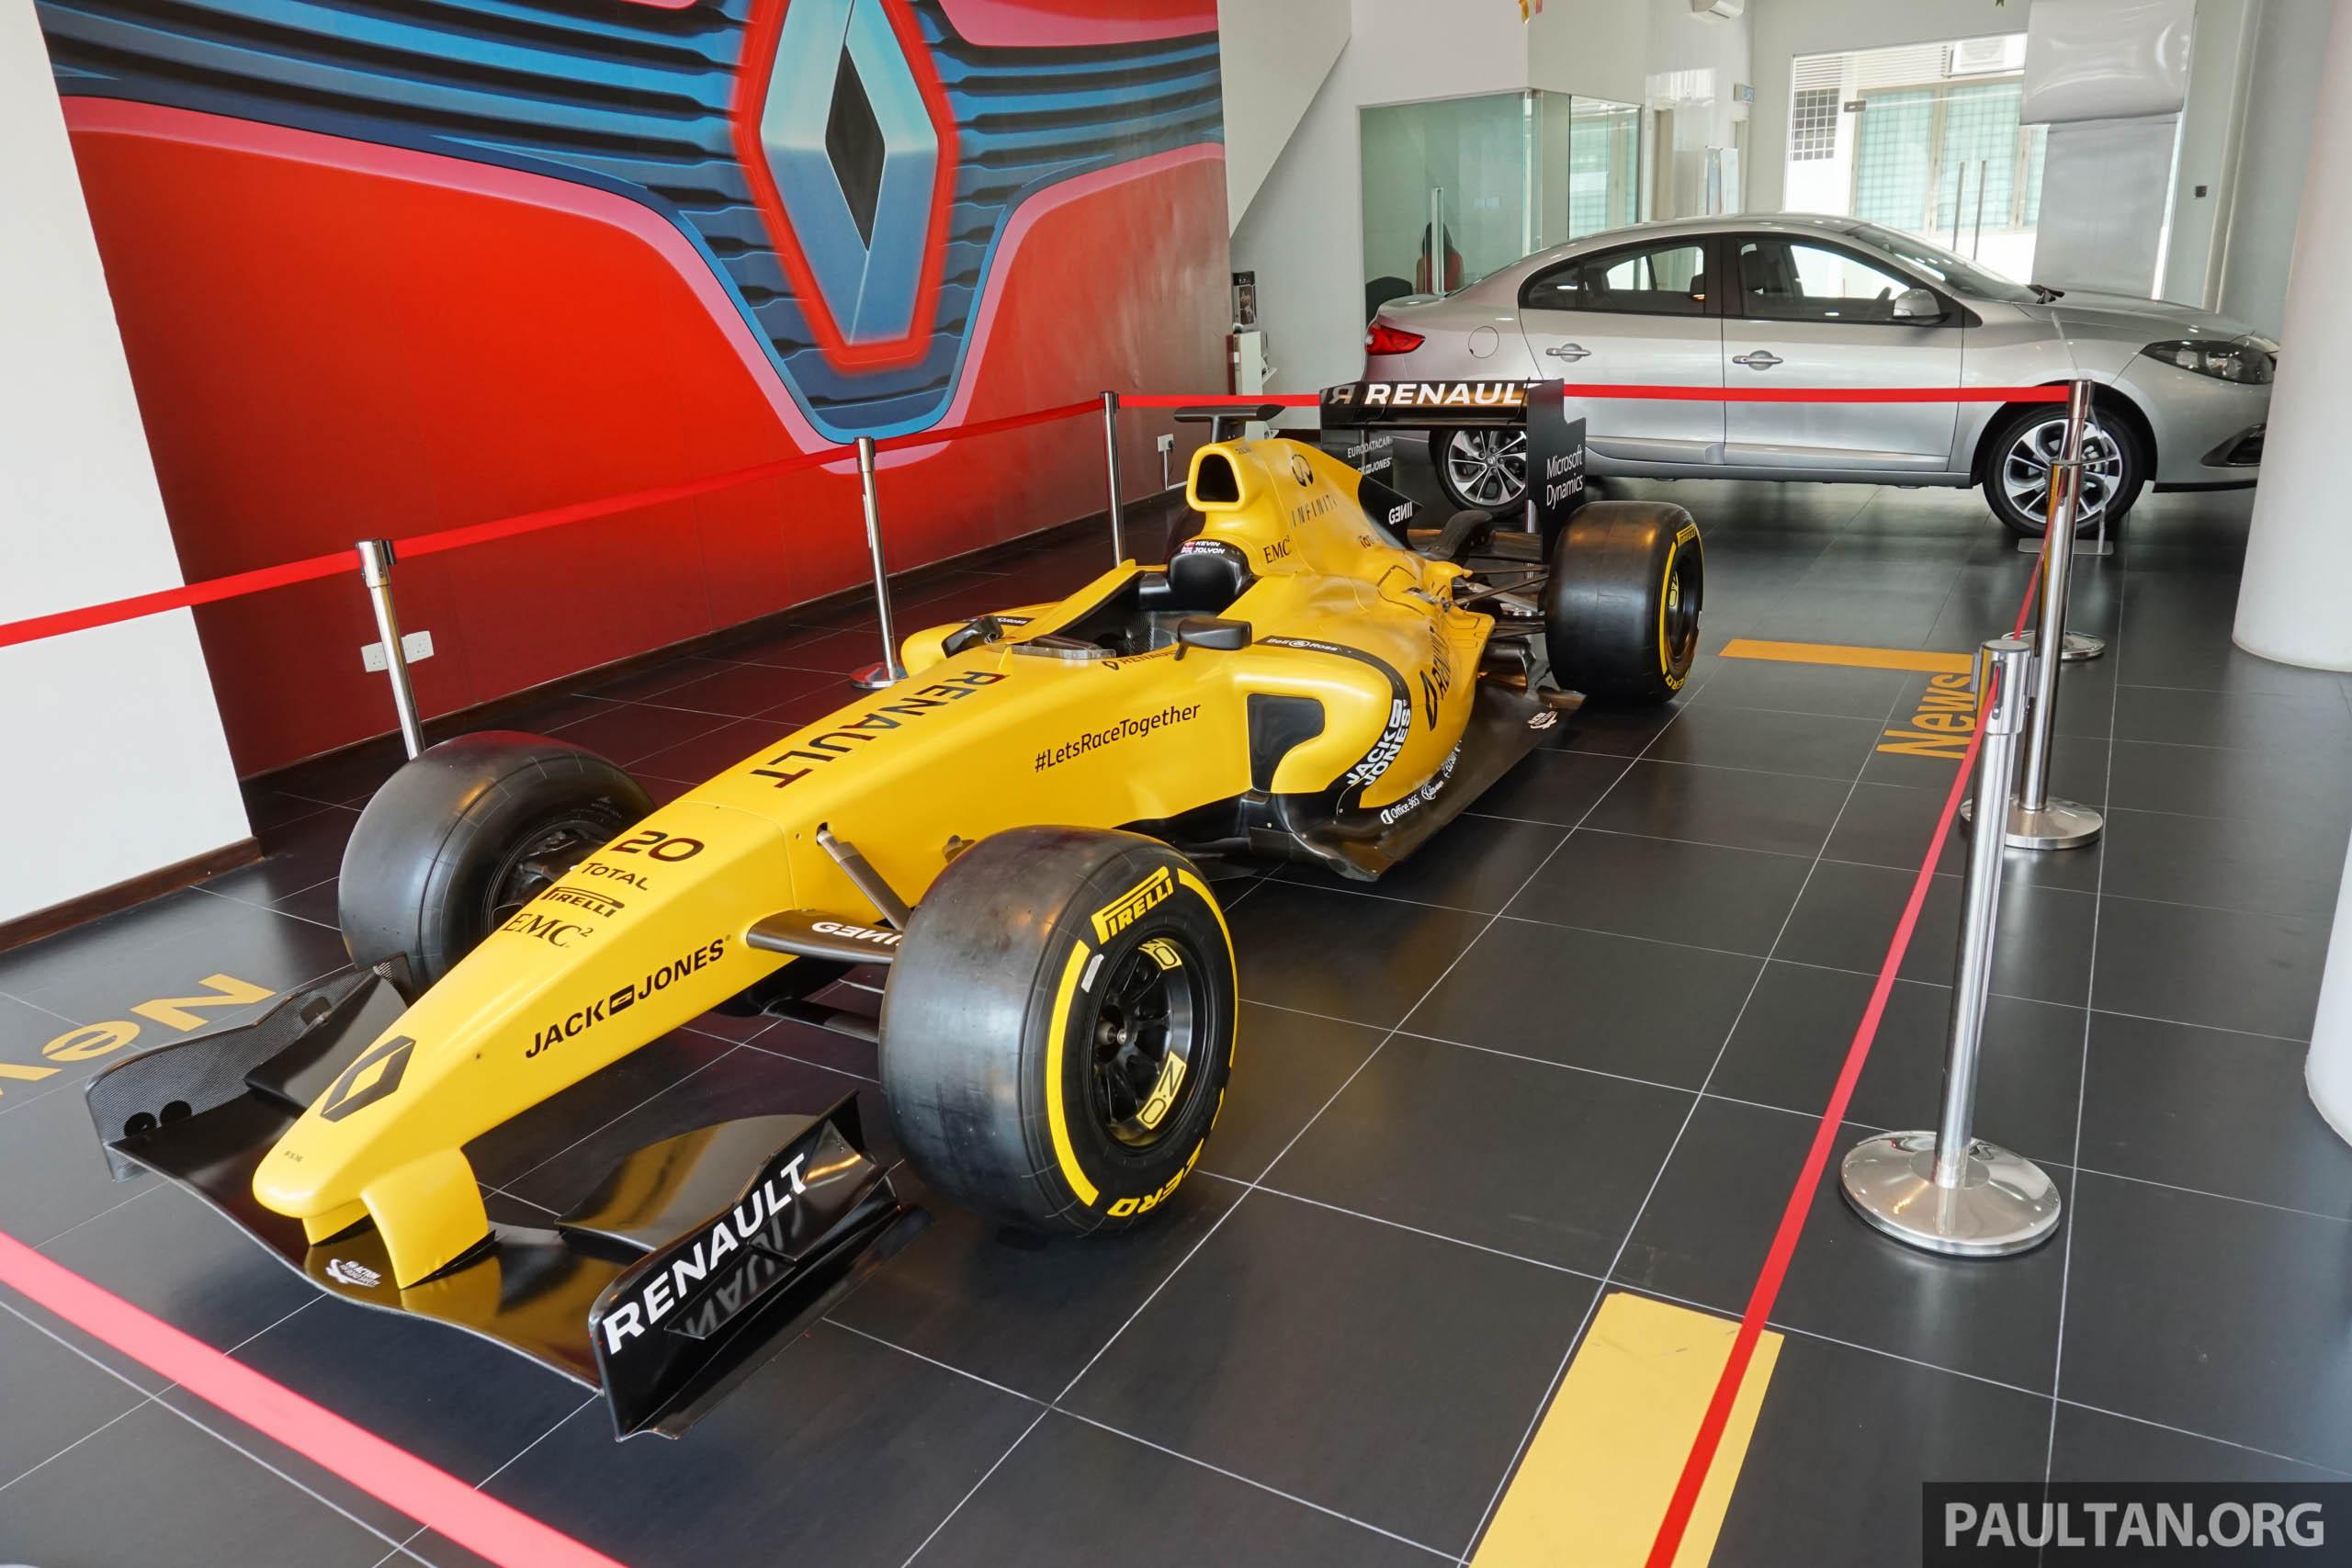 2016 renault rs 16 formula one race car replica on tour at. Black Bedroom Furniture Sets. Home Design Ideas